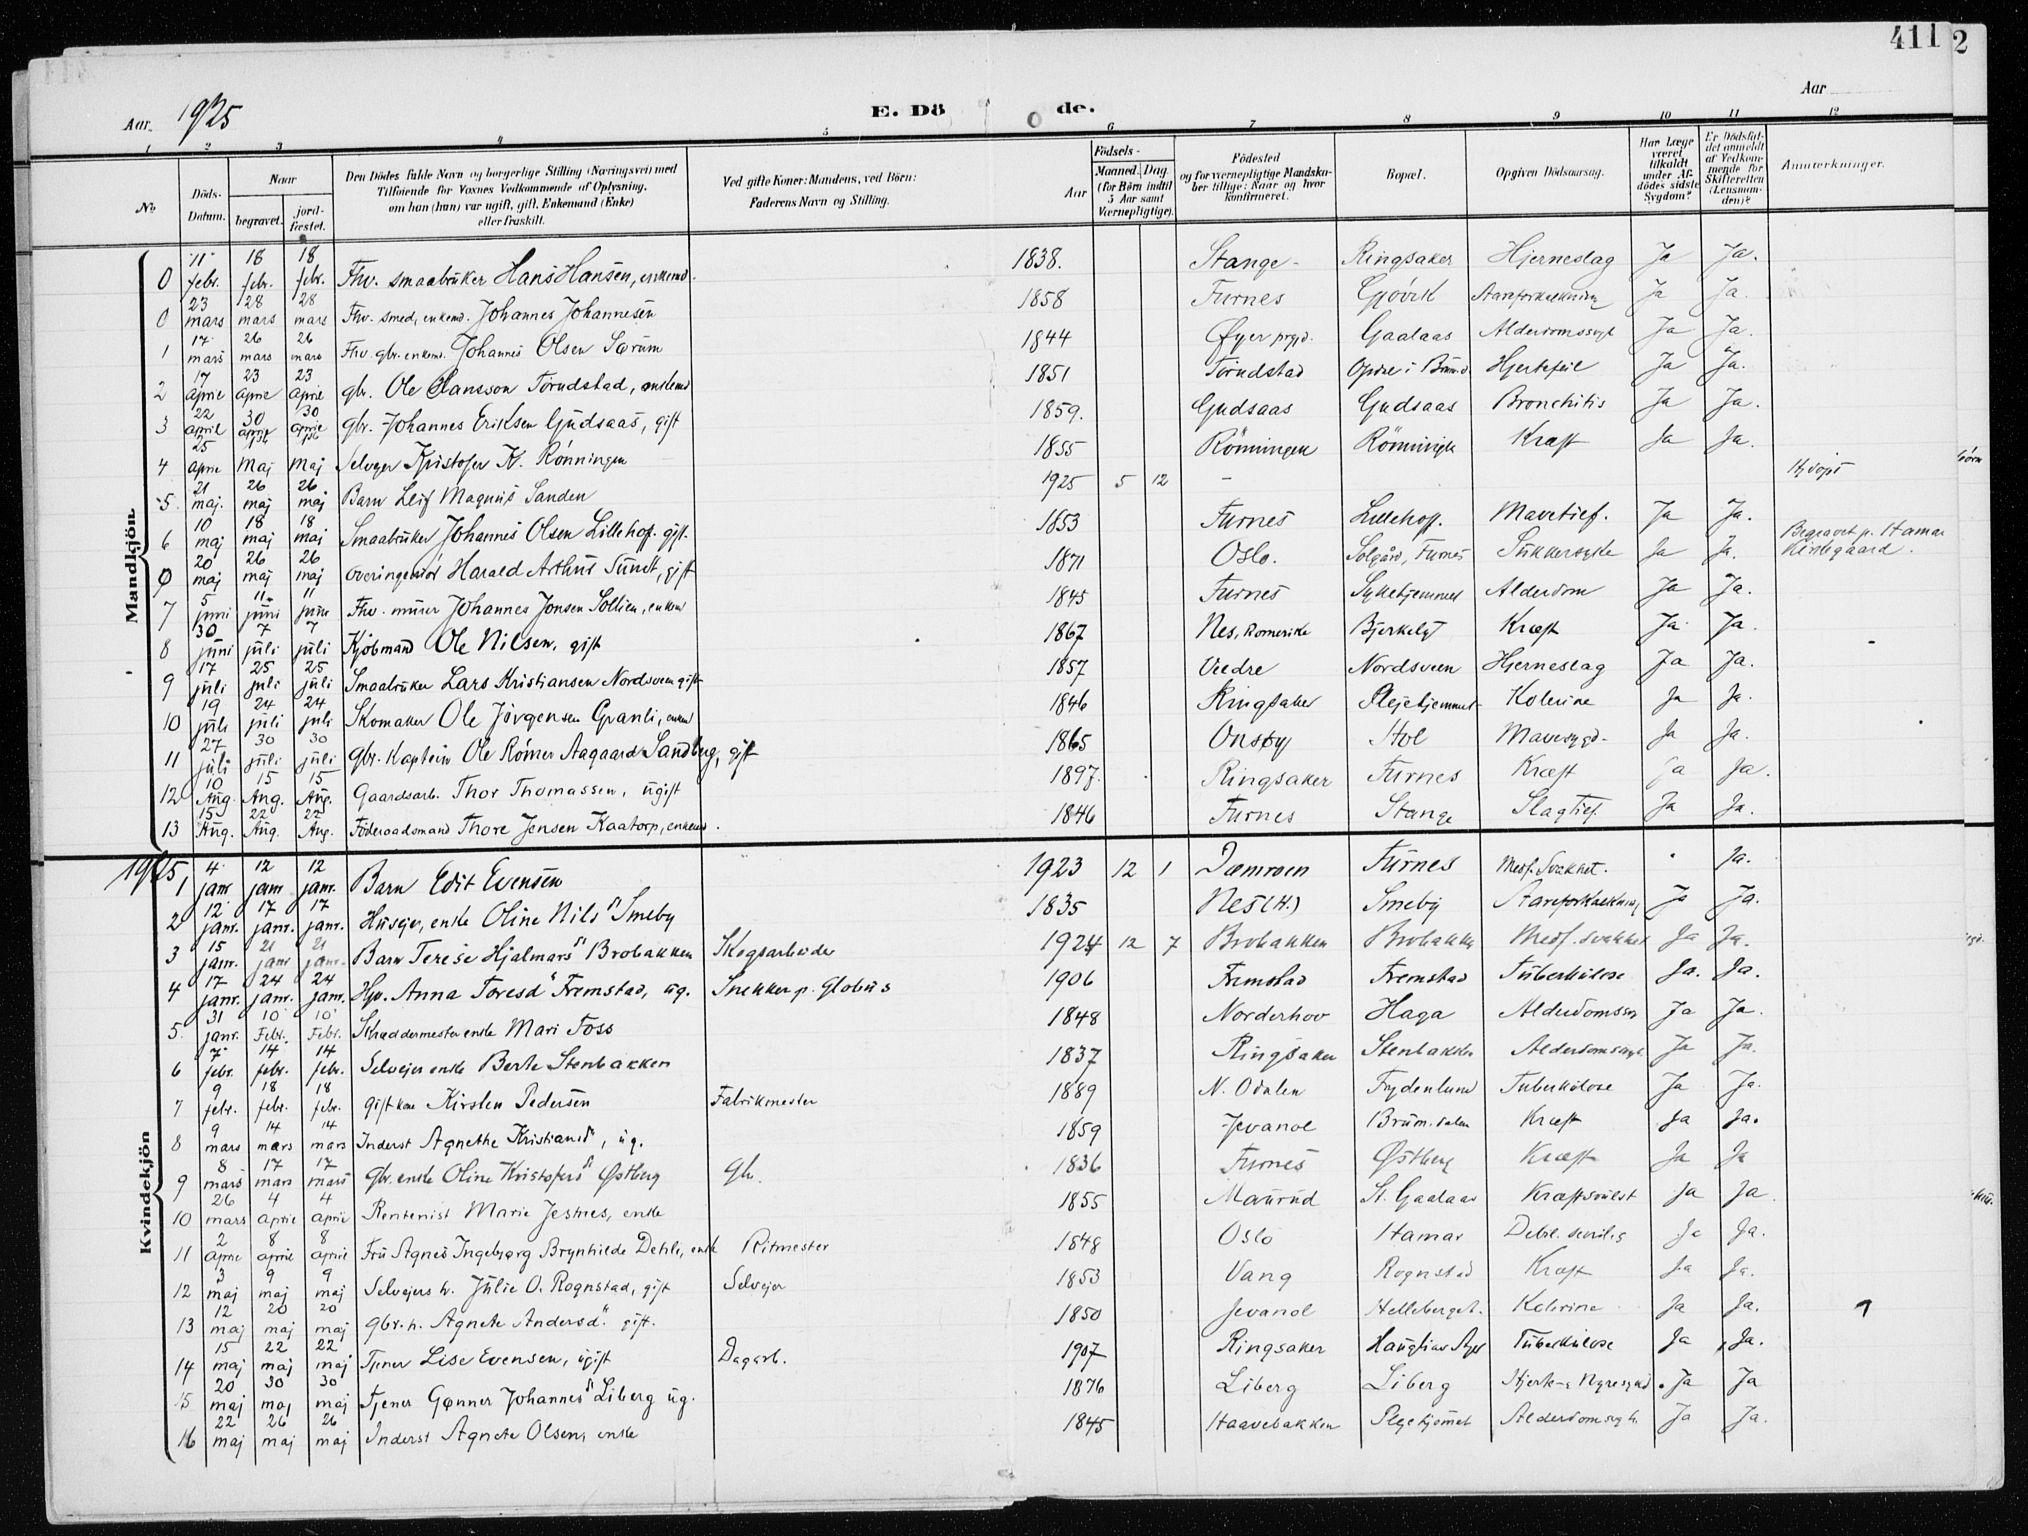 SAH, Furnes prestekontor, K/Ka/L0001: Ministerialbok nr. 1, 1907-1935, s. 411